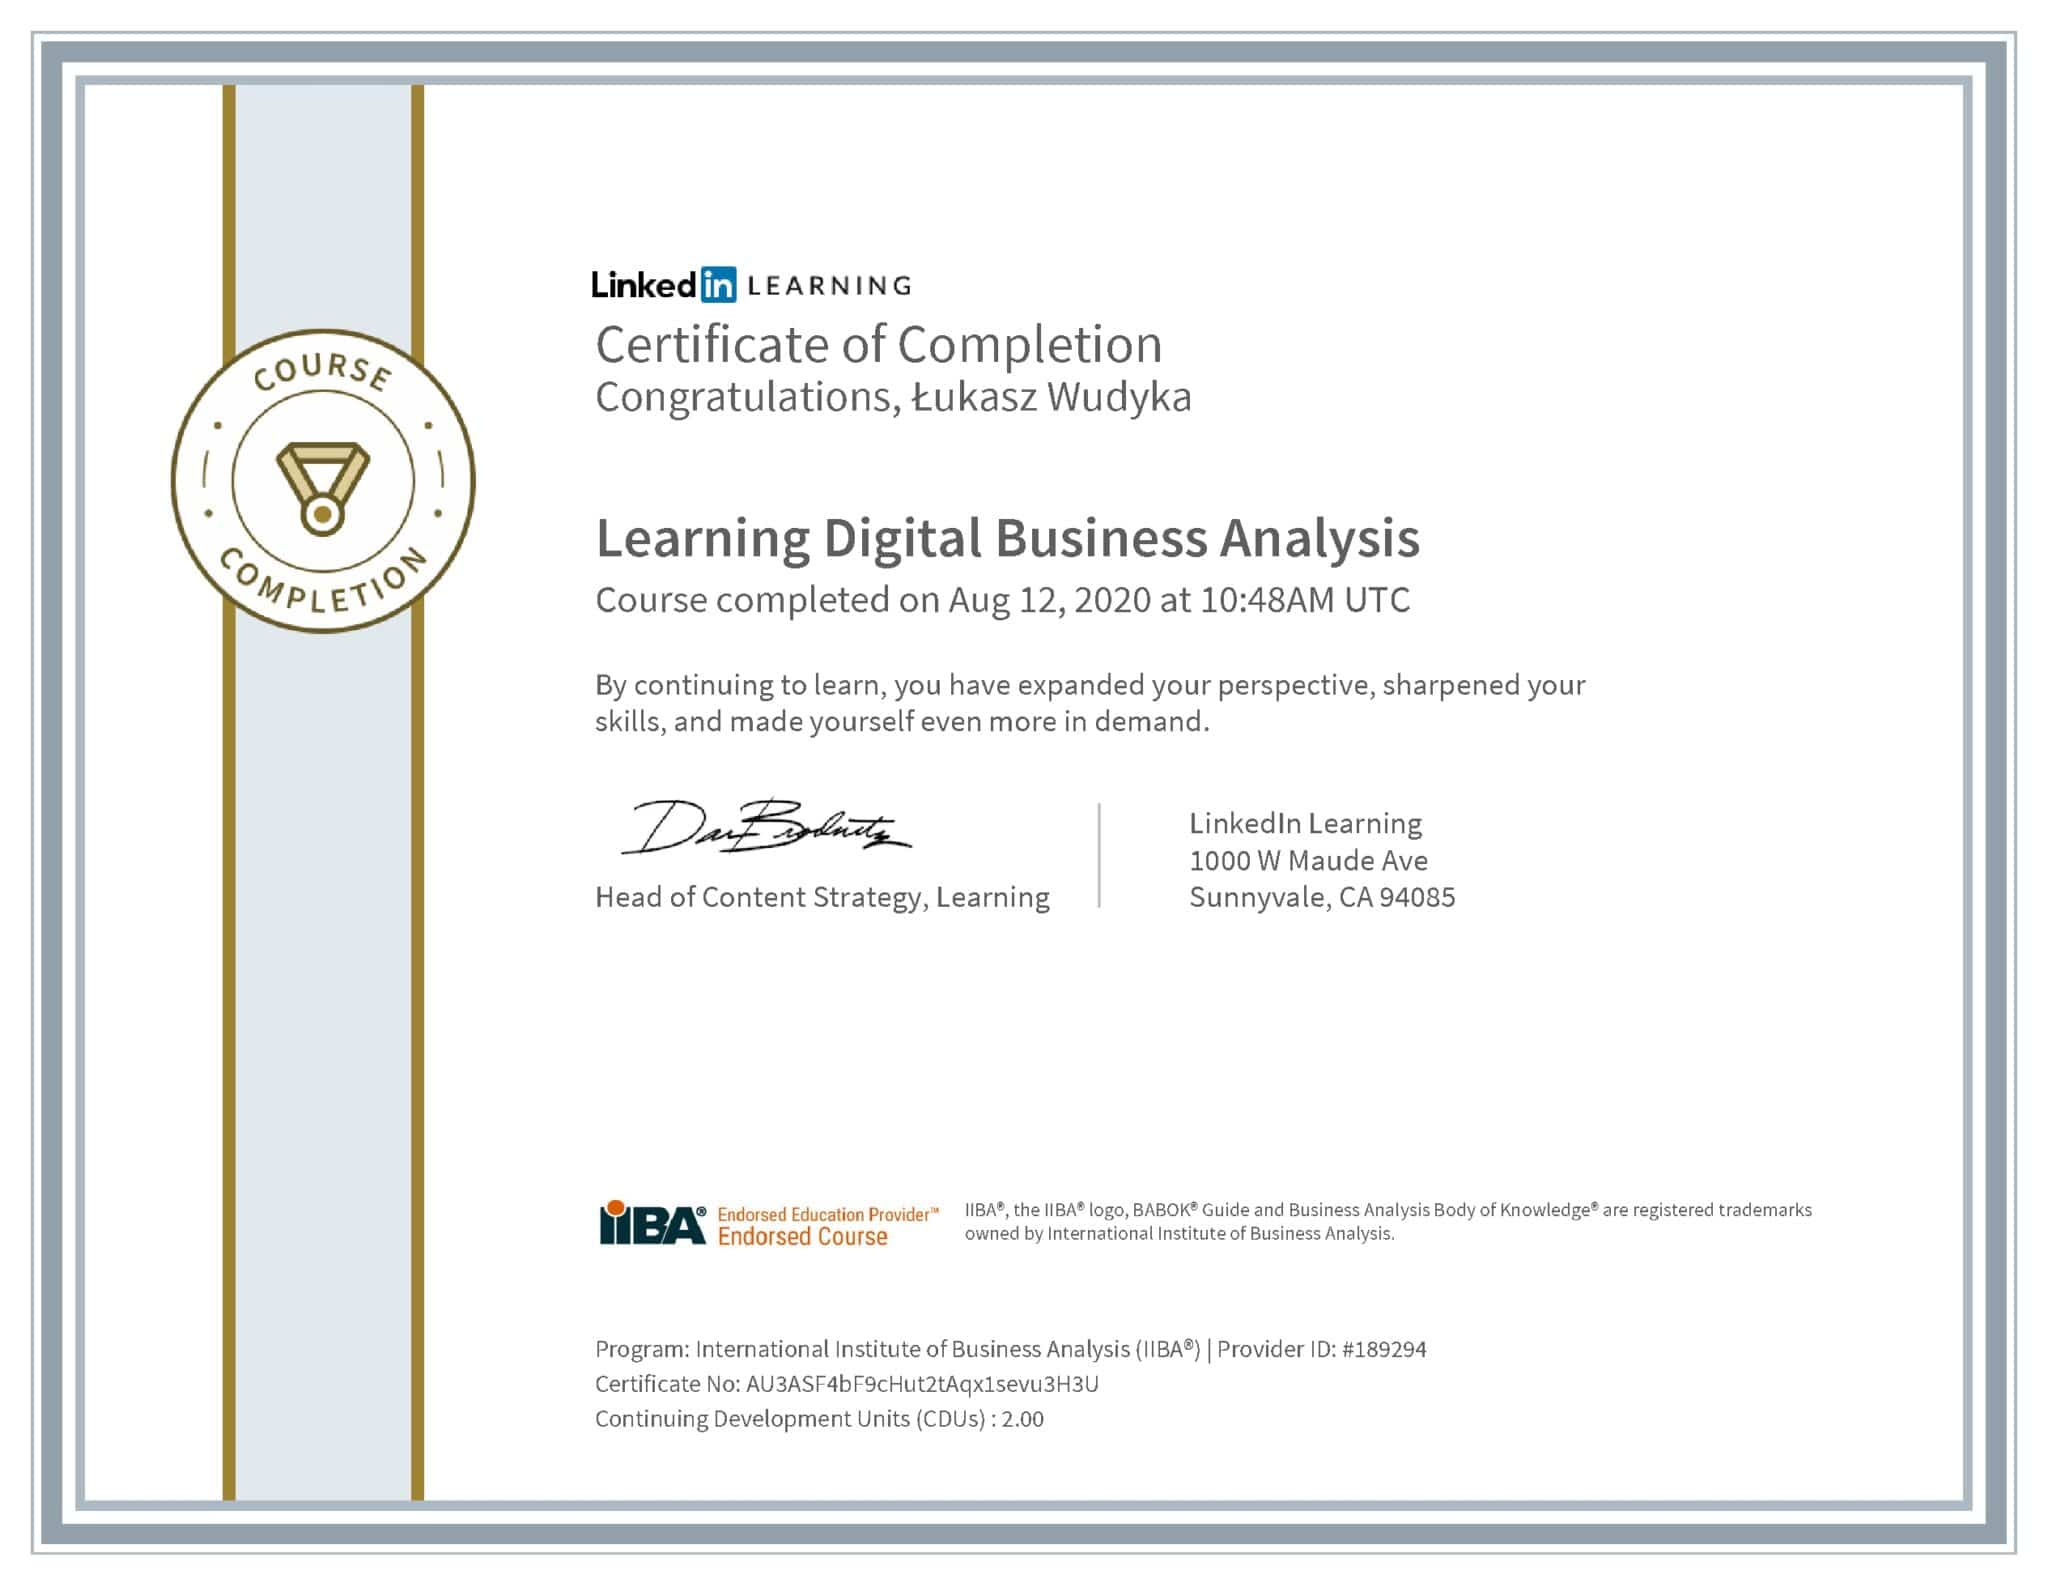 Łukasz Wudyka certyfikat LinkedIn Learning Digital Business Analysis IIBA